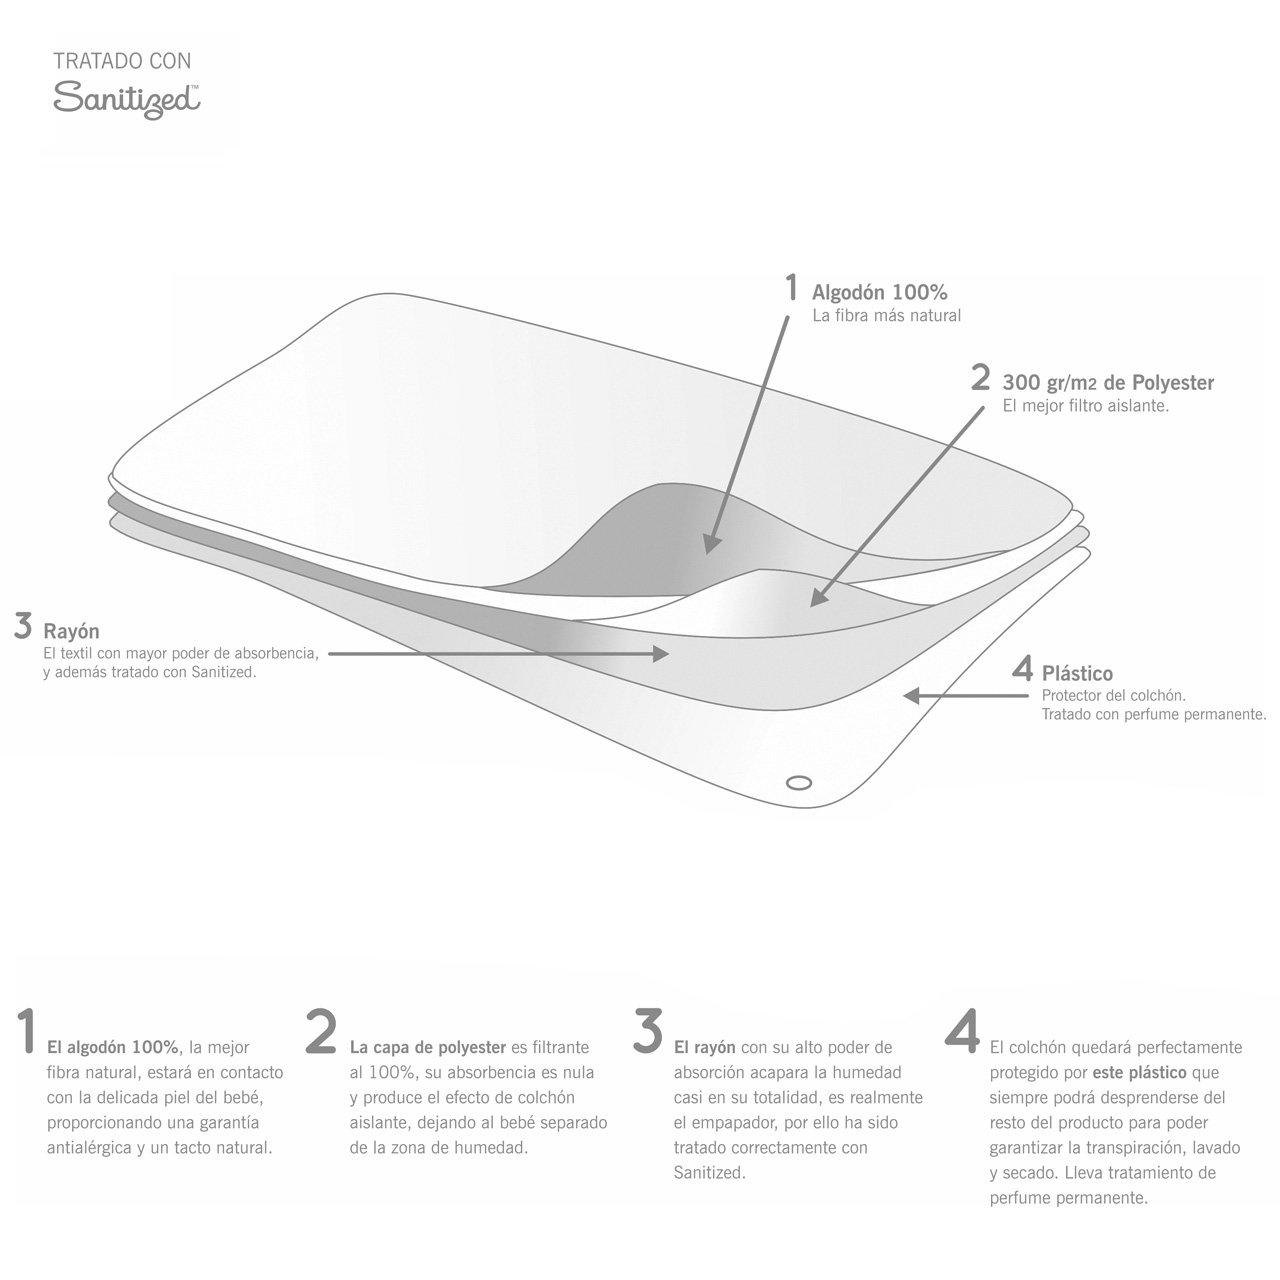 Cambrass Basket/Pram Super Absorber (35 x 73 cm, Liso E White) 3036